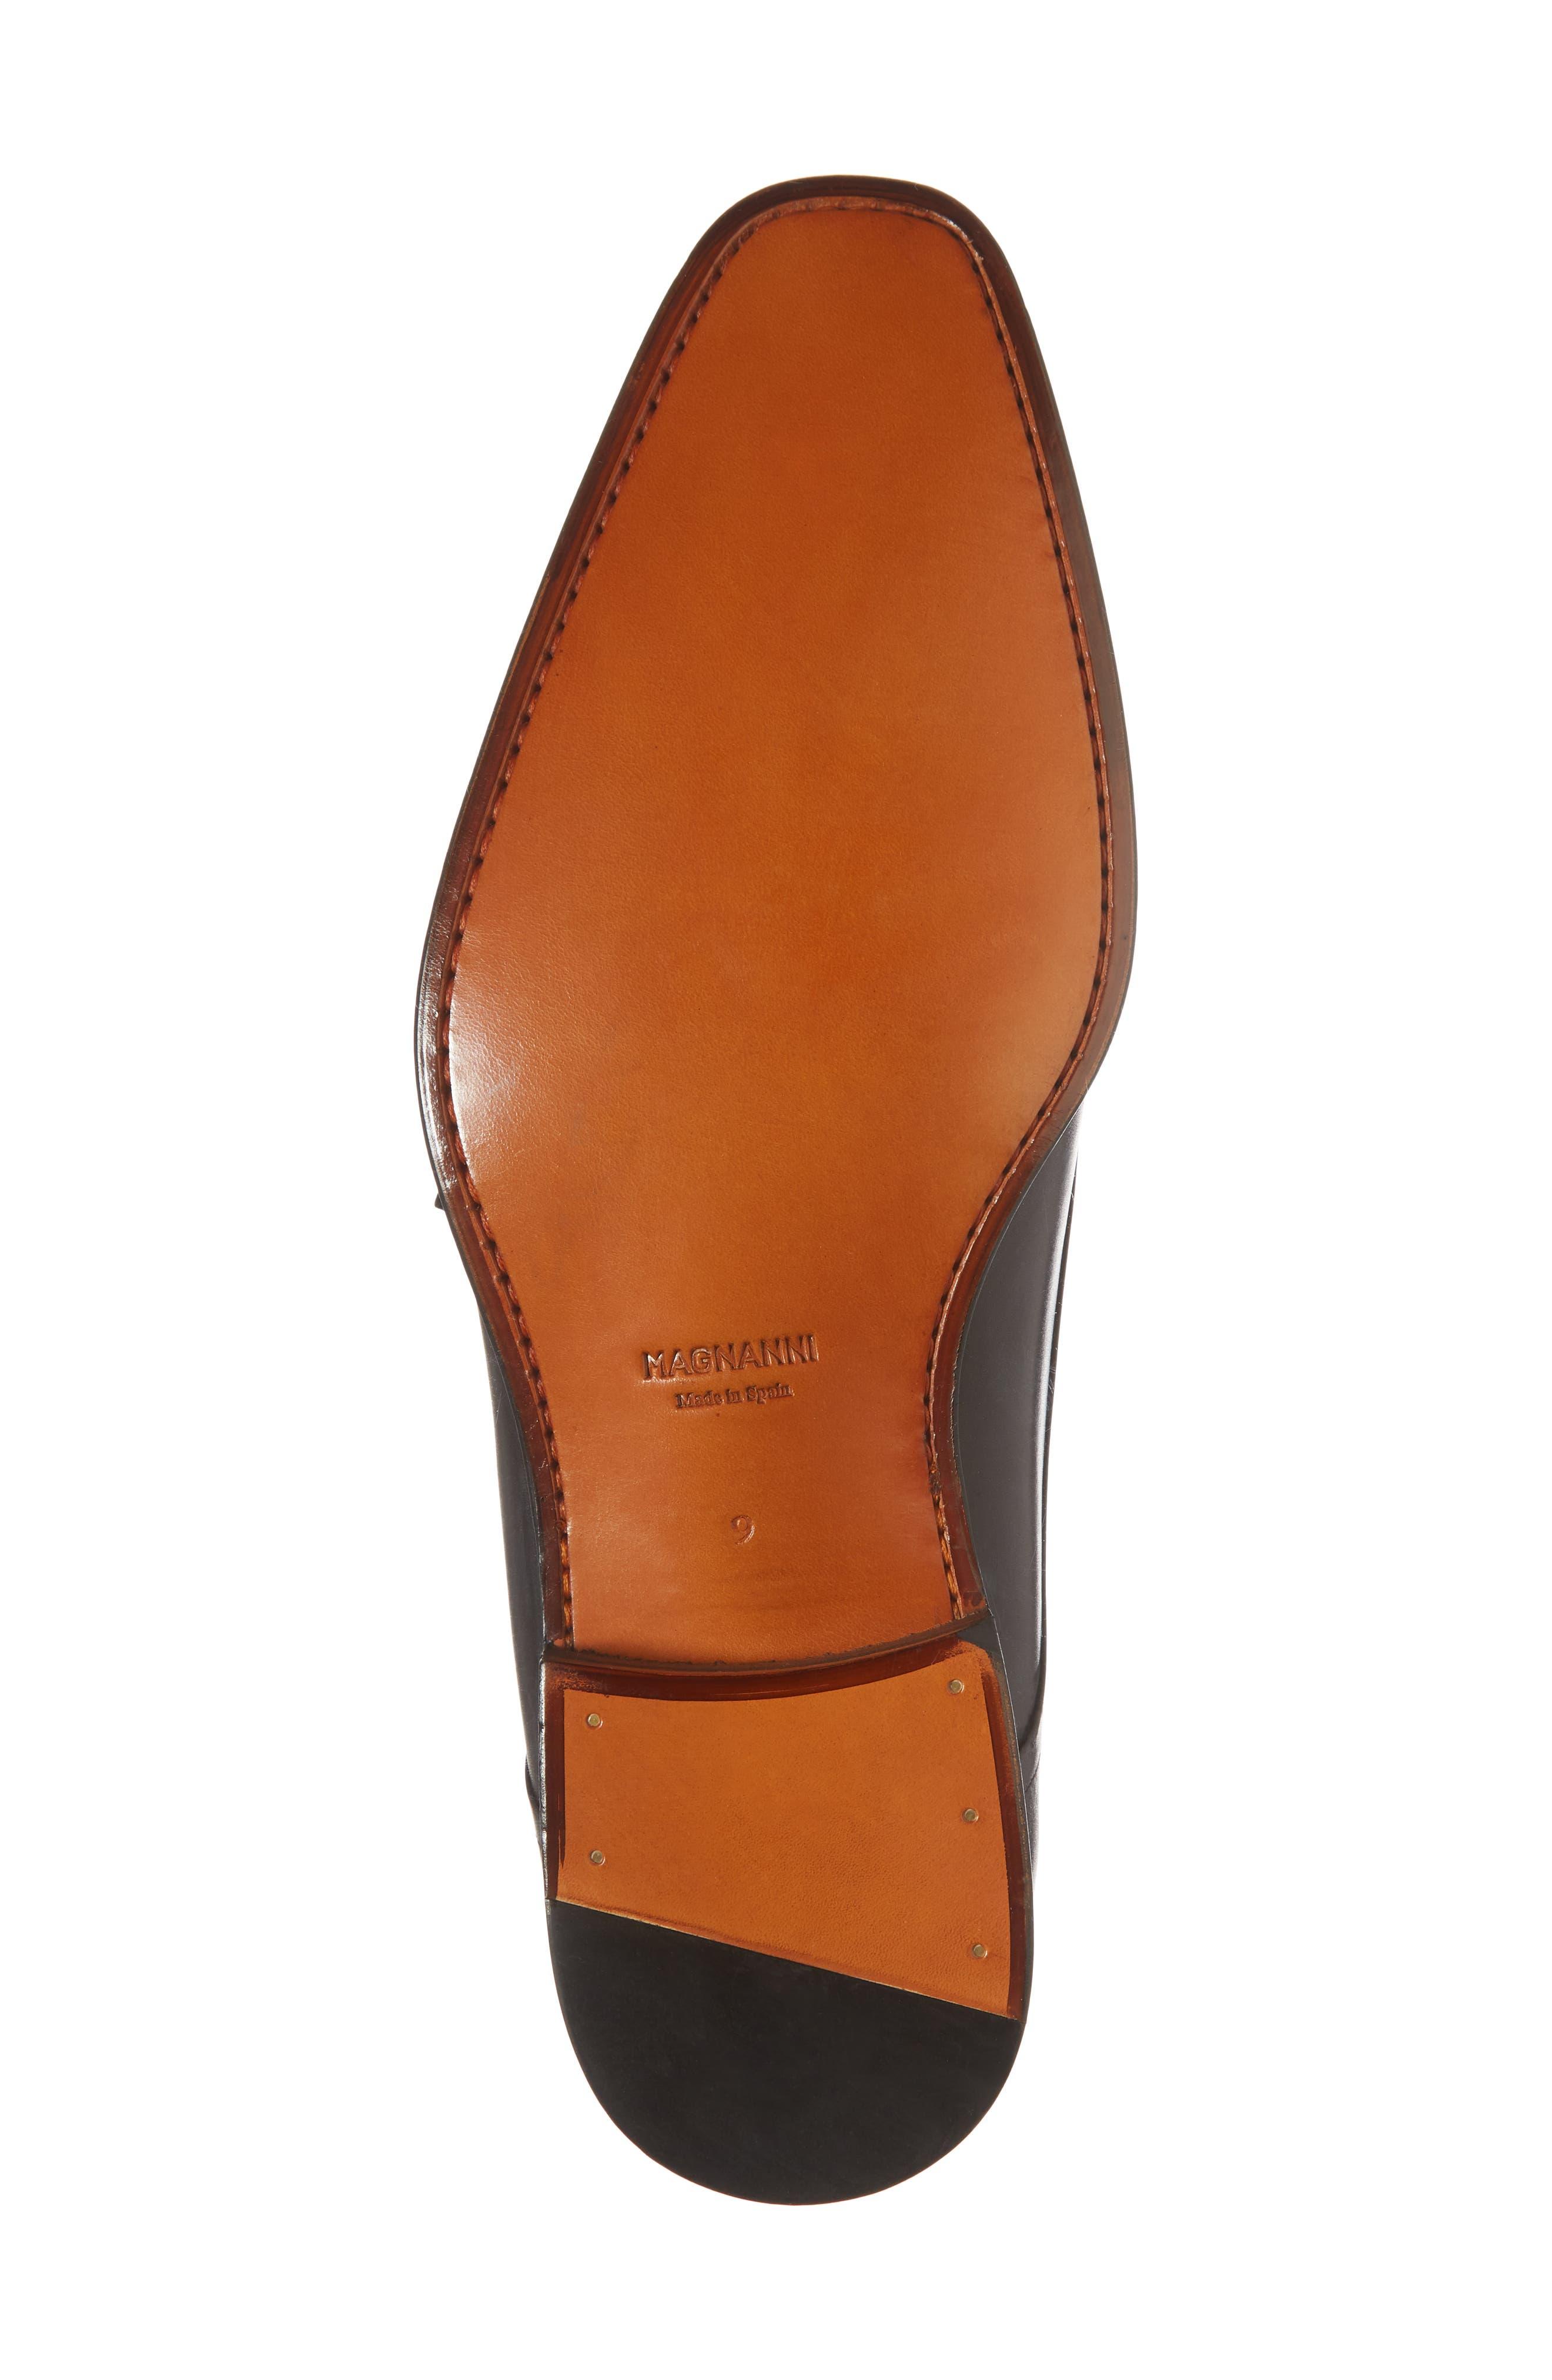 Silvio Double Monk Strap Shoe,                             Alternate thumbnail 6, color,                             Black Leather